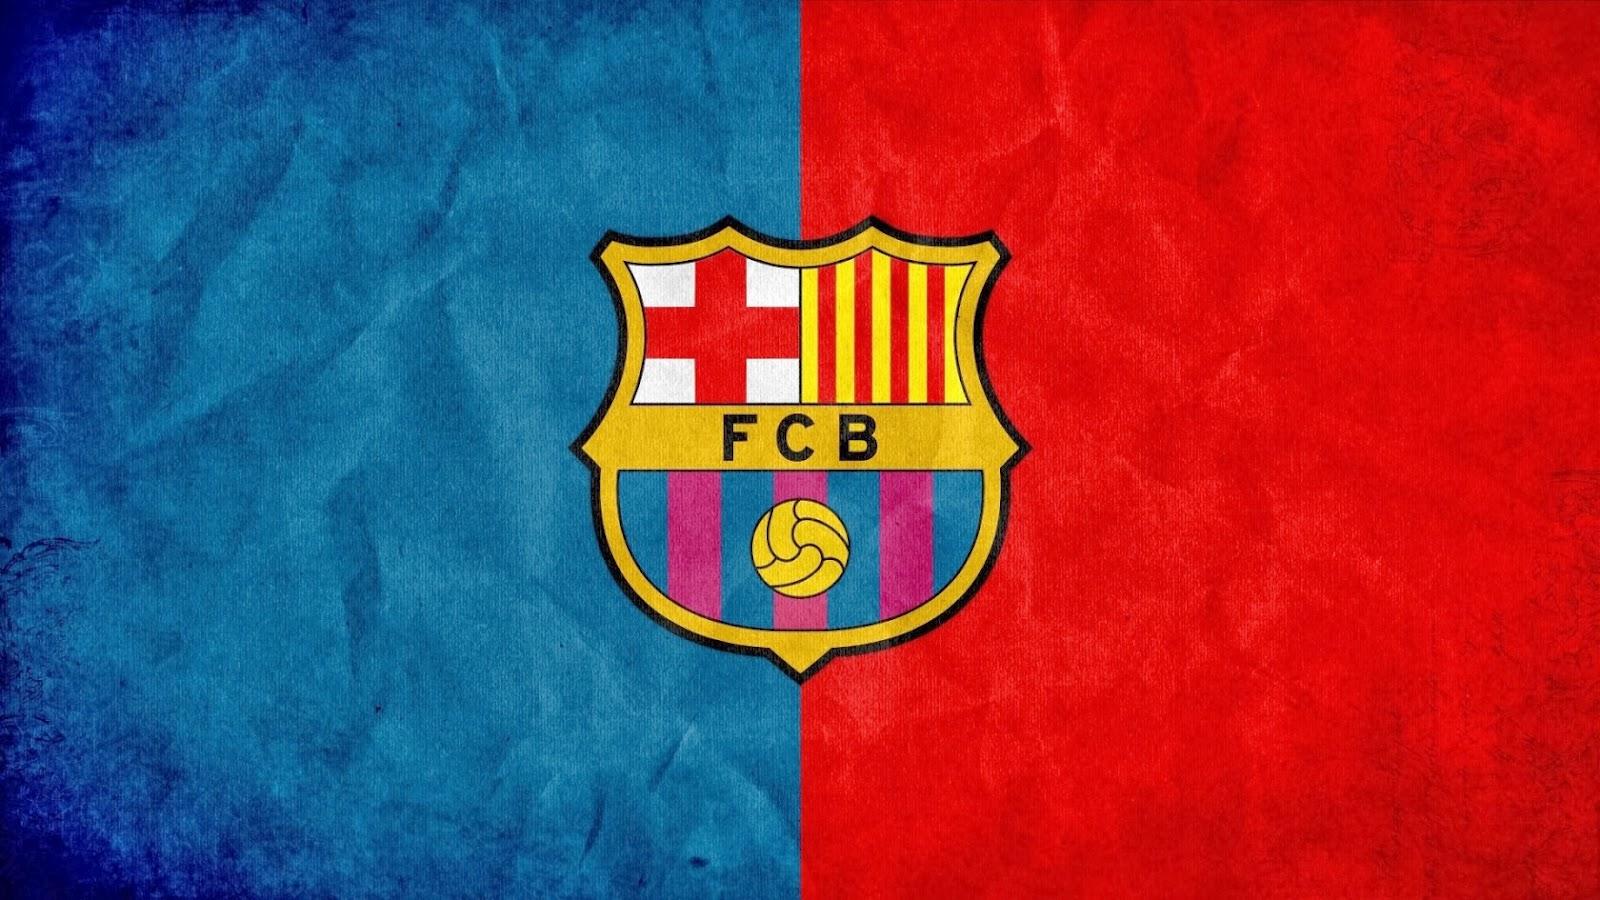 barcelona fc logo hd wallpaper 2014 2015 football